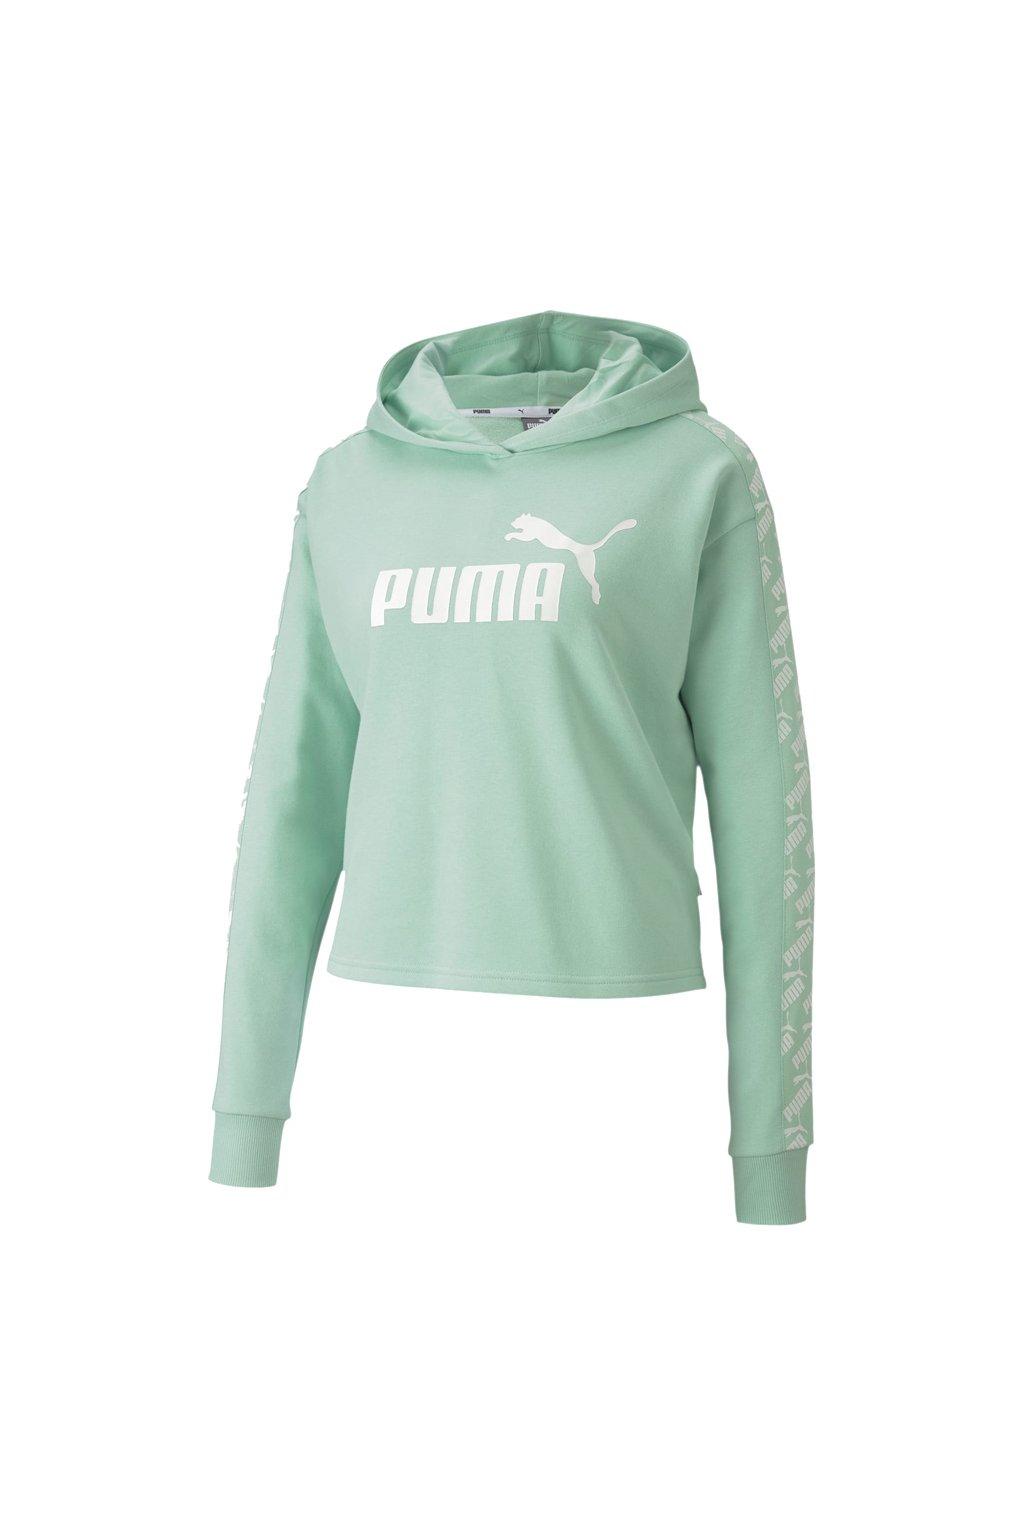 Dámska mikina Puma Amplified Hoody TR zelená 581717 32